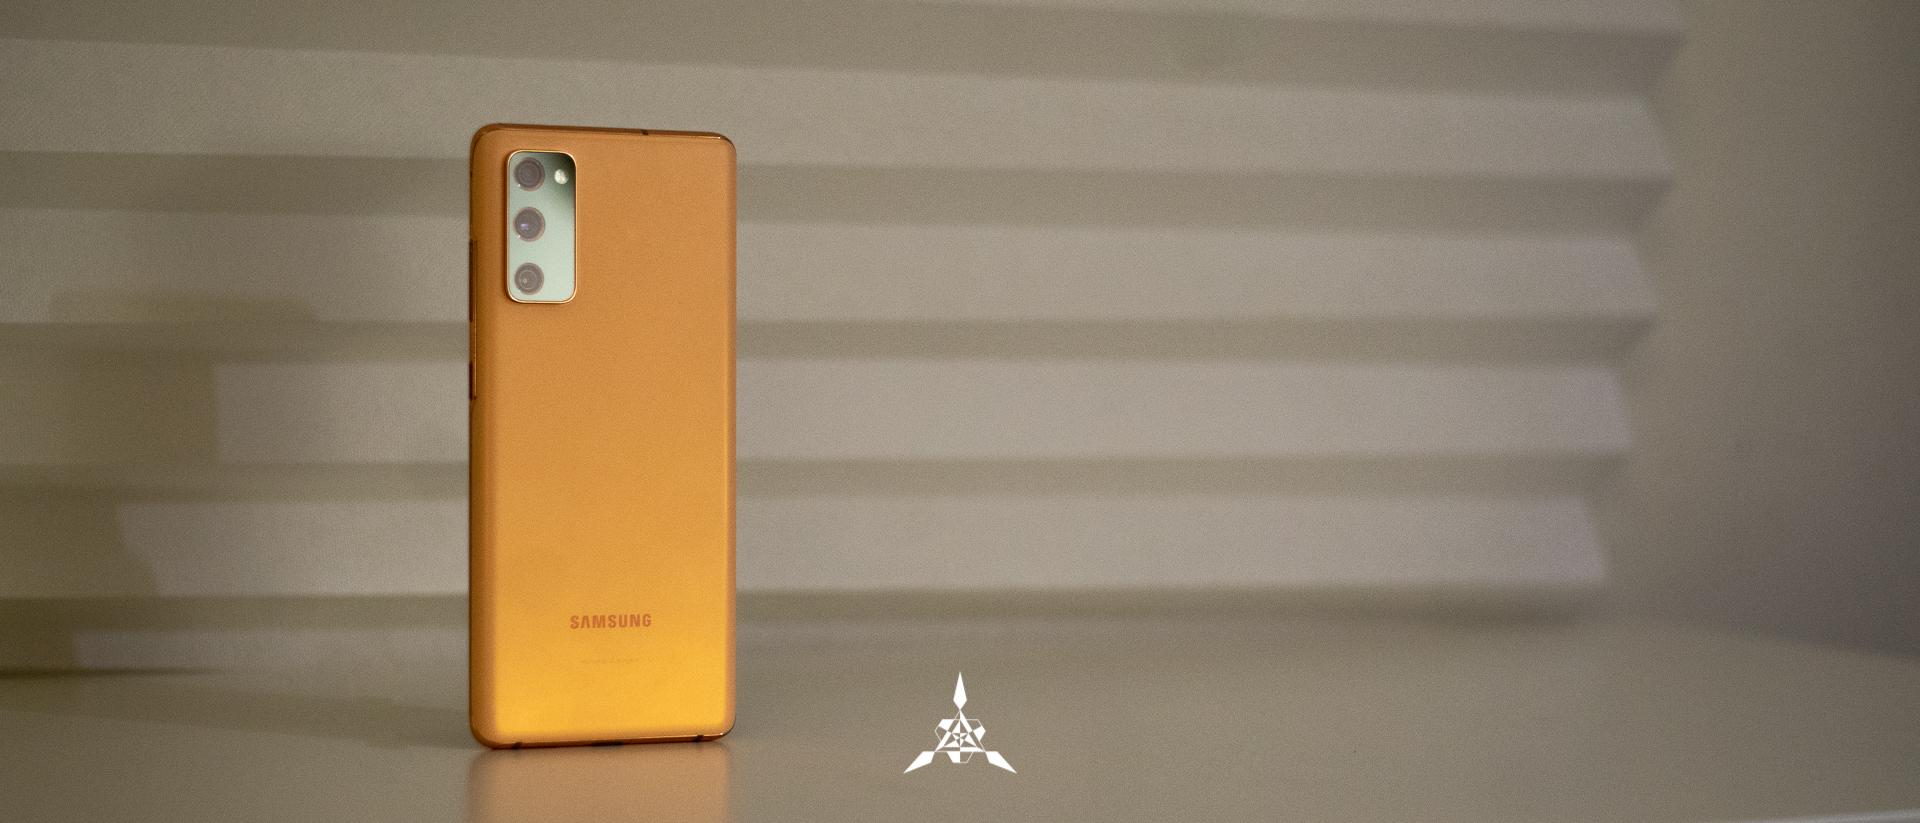 http://server.digimetriq.com/wp-content/uploads/2020/12/Samsung-Galaxy-S20-FE-Review-We-Want-One.jpg